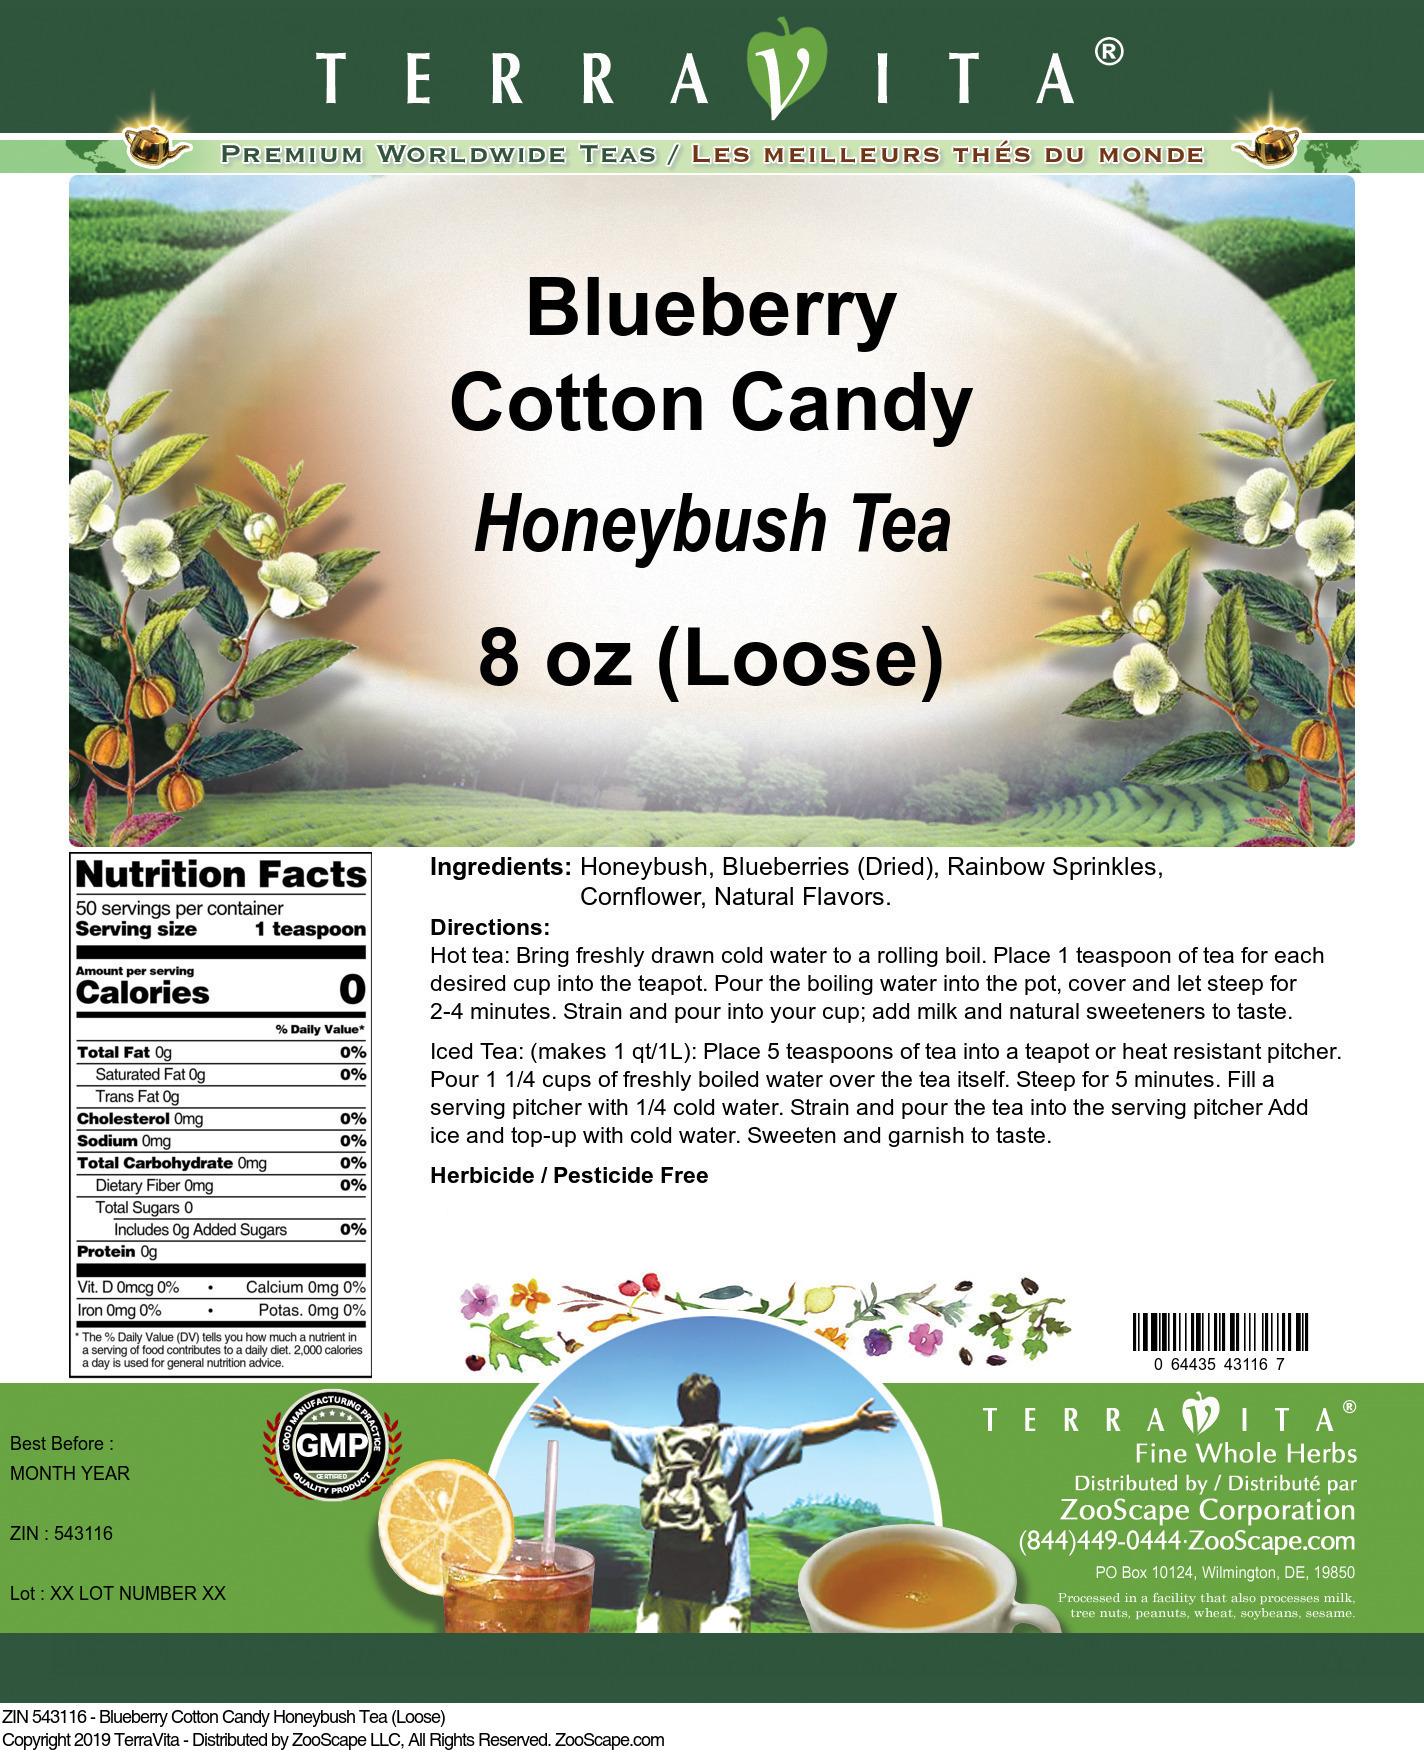 Blueberry Cotton Candy Honeybush Tea (Loose)